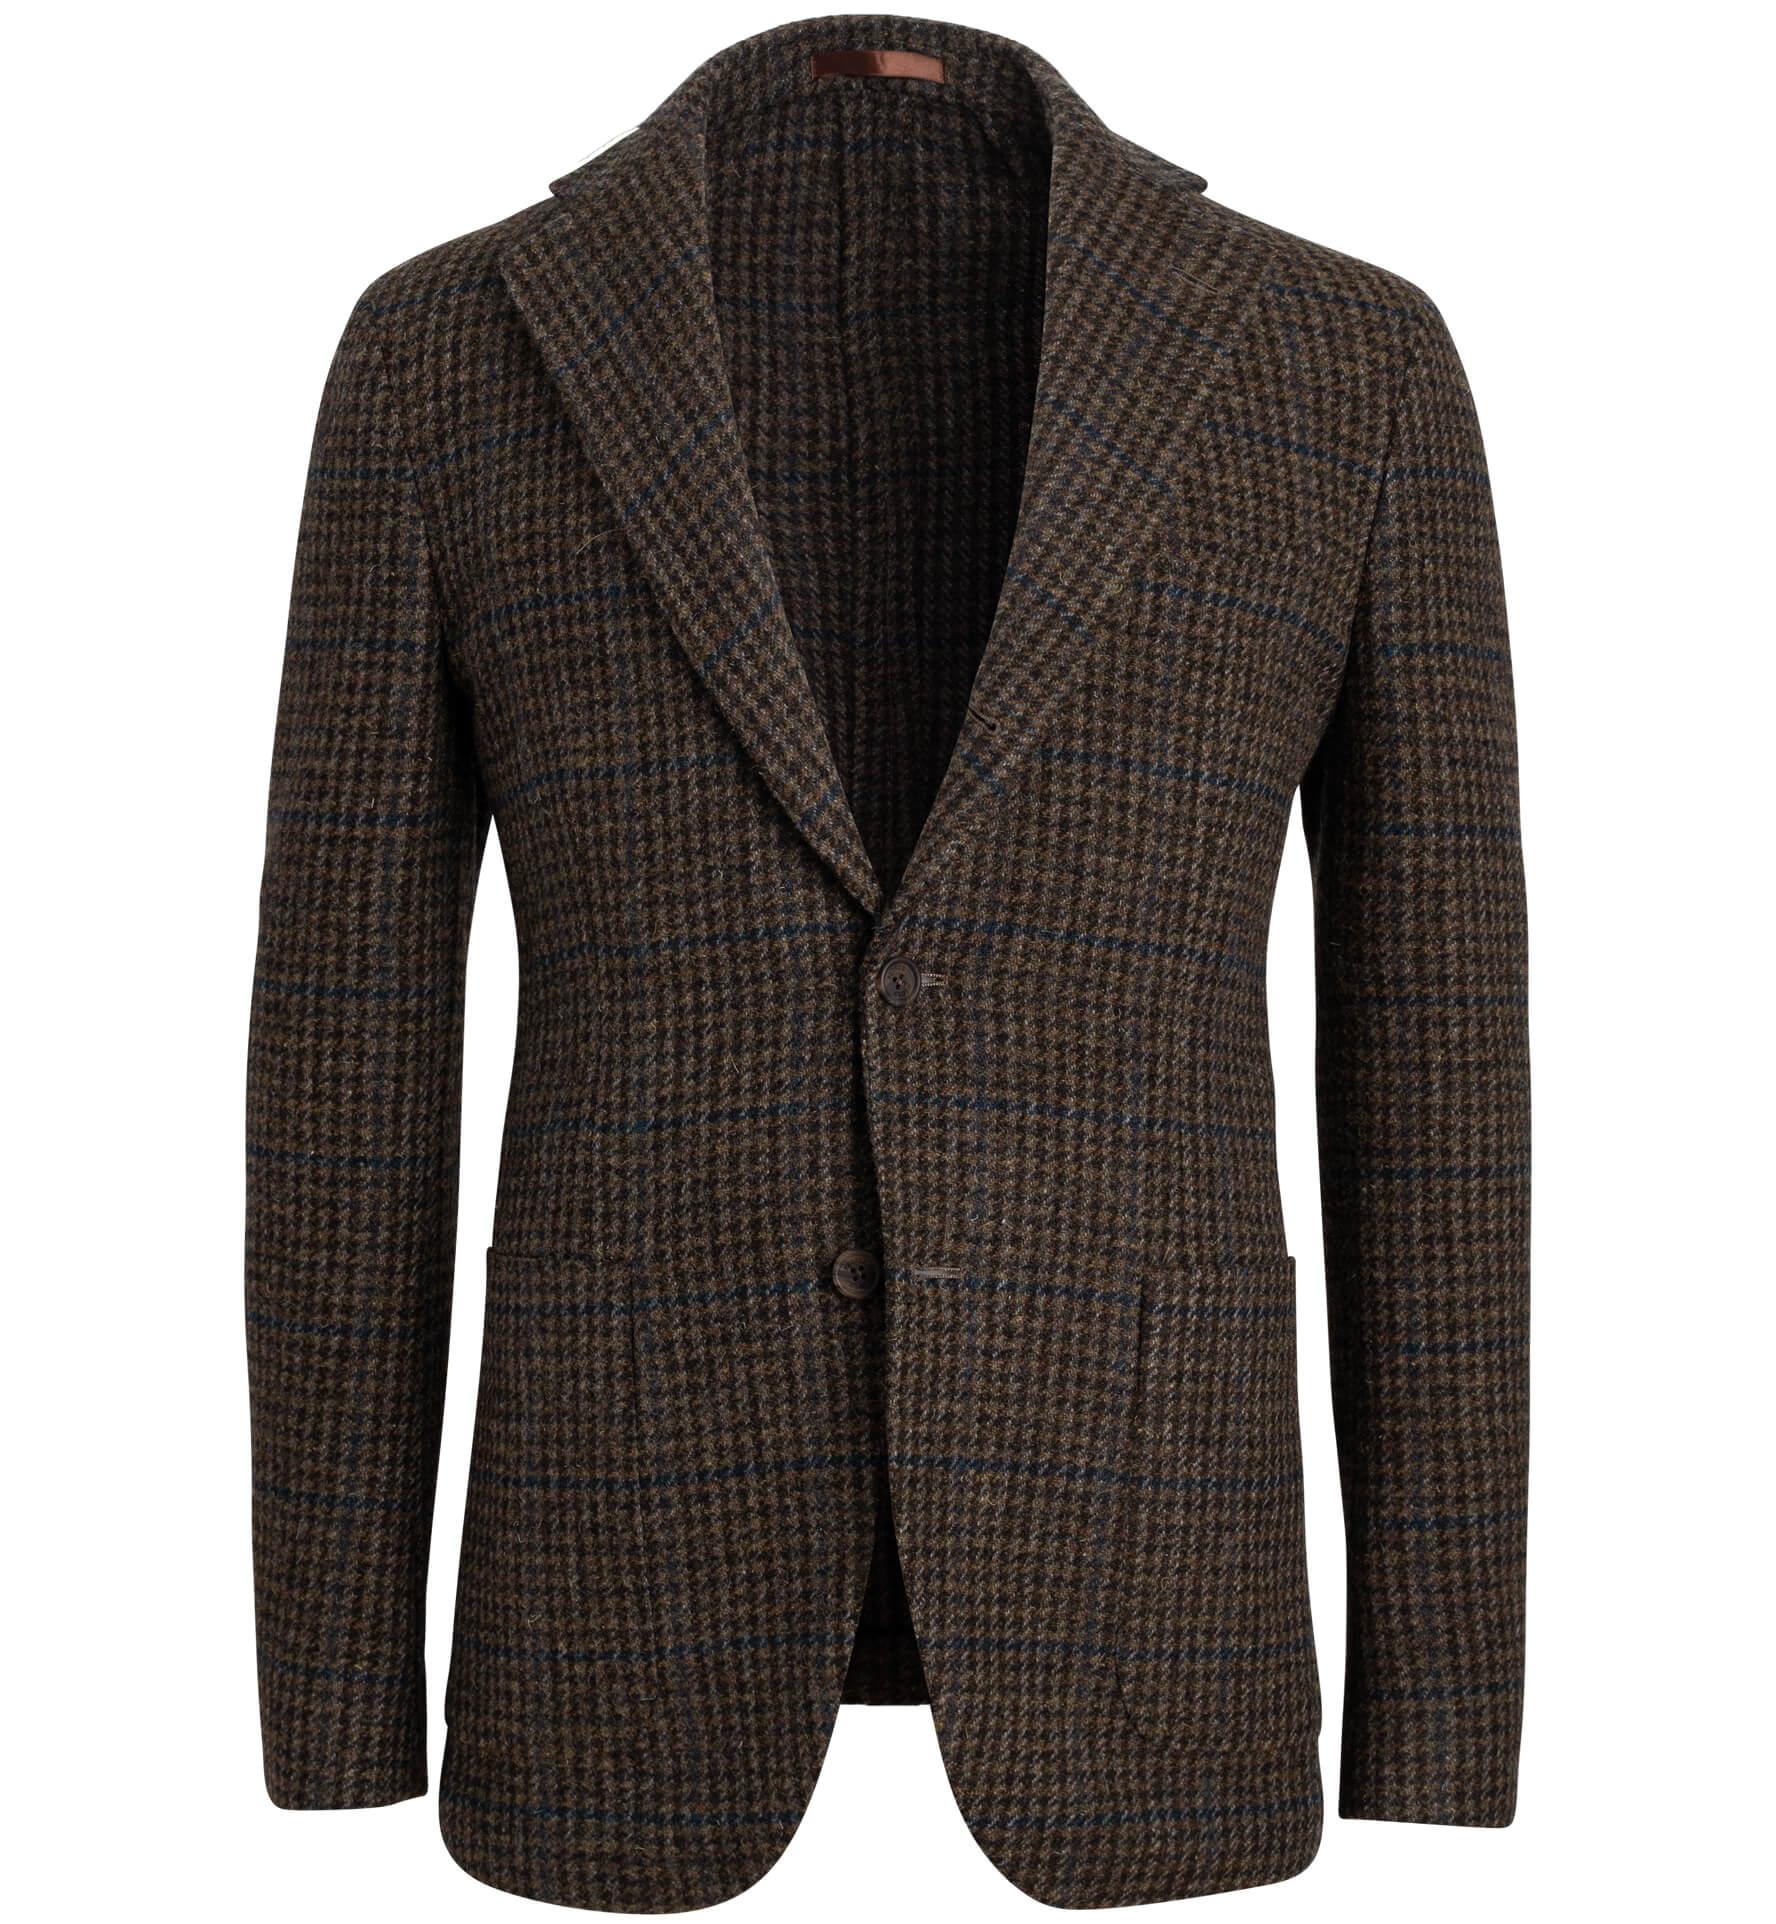 Zoom Image of Waverly  Washed Tweed Gun Check Jacket